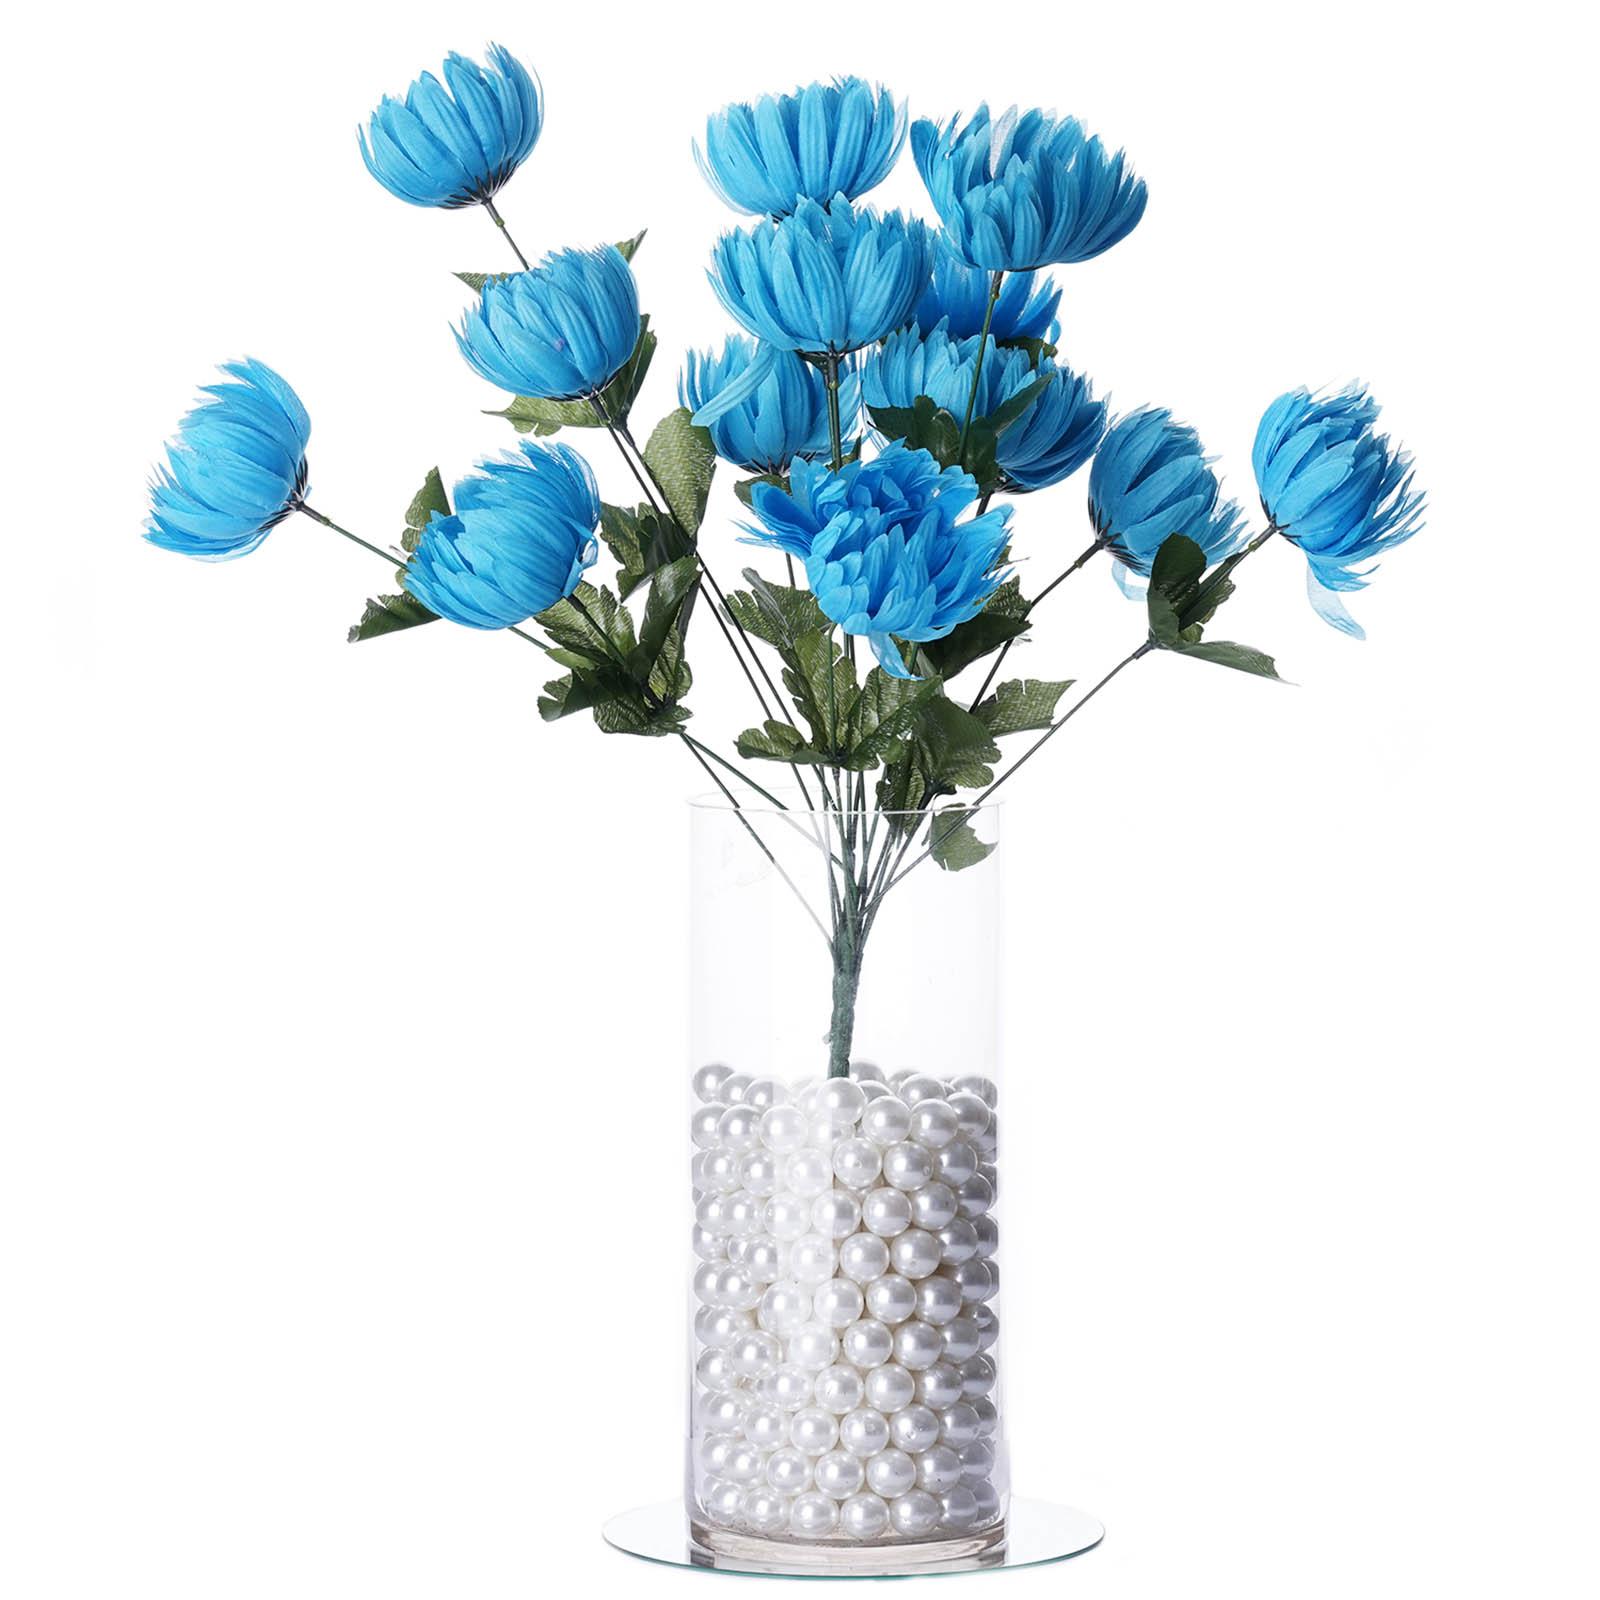 BalsaCircle 56 Silk Chrysanthemum Mums Flowers - DIY Autumn Home ...